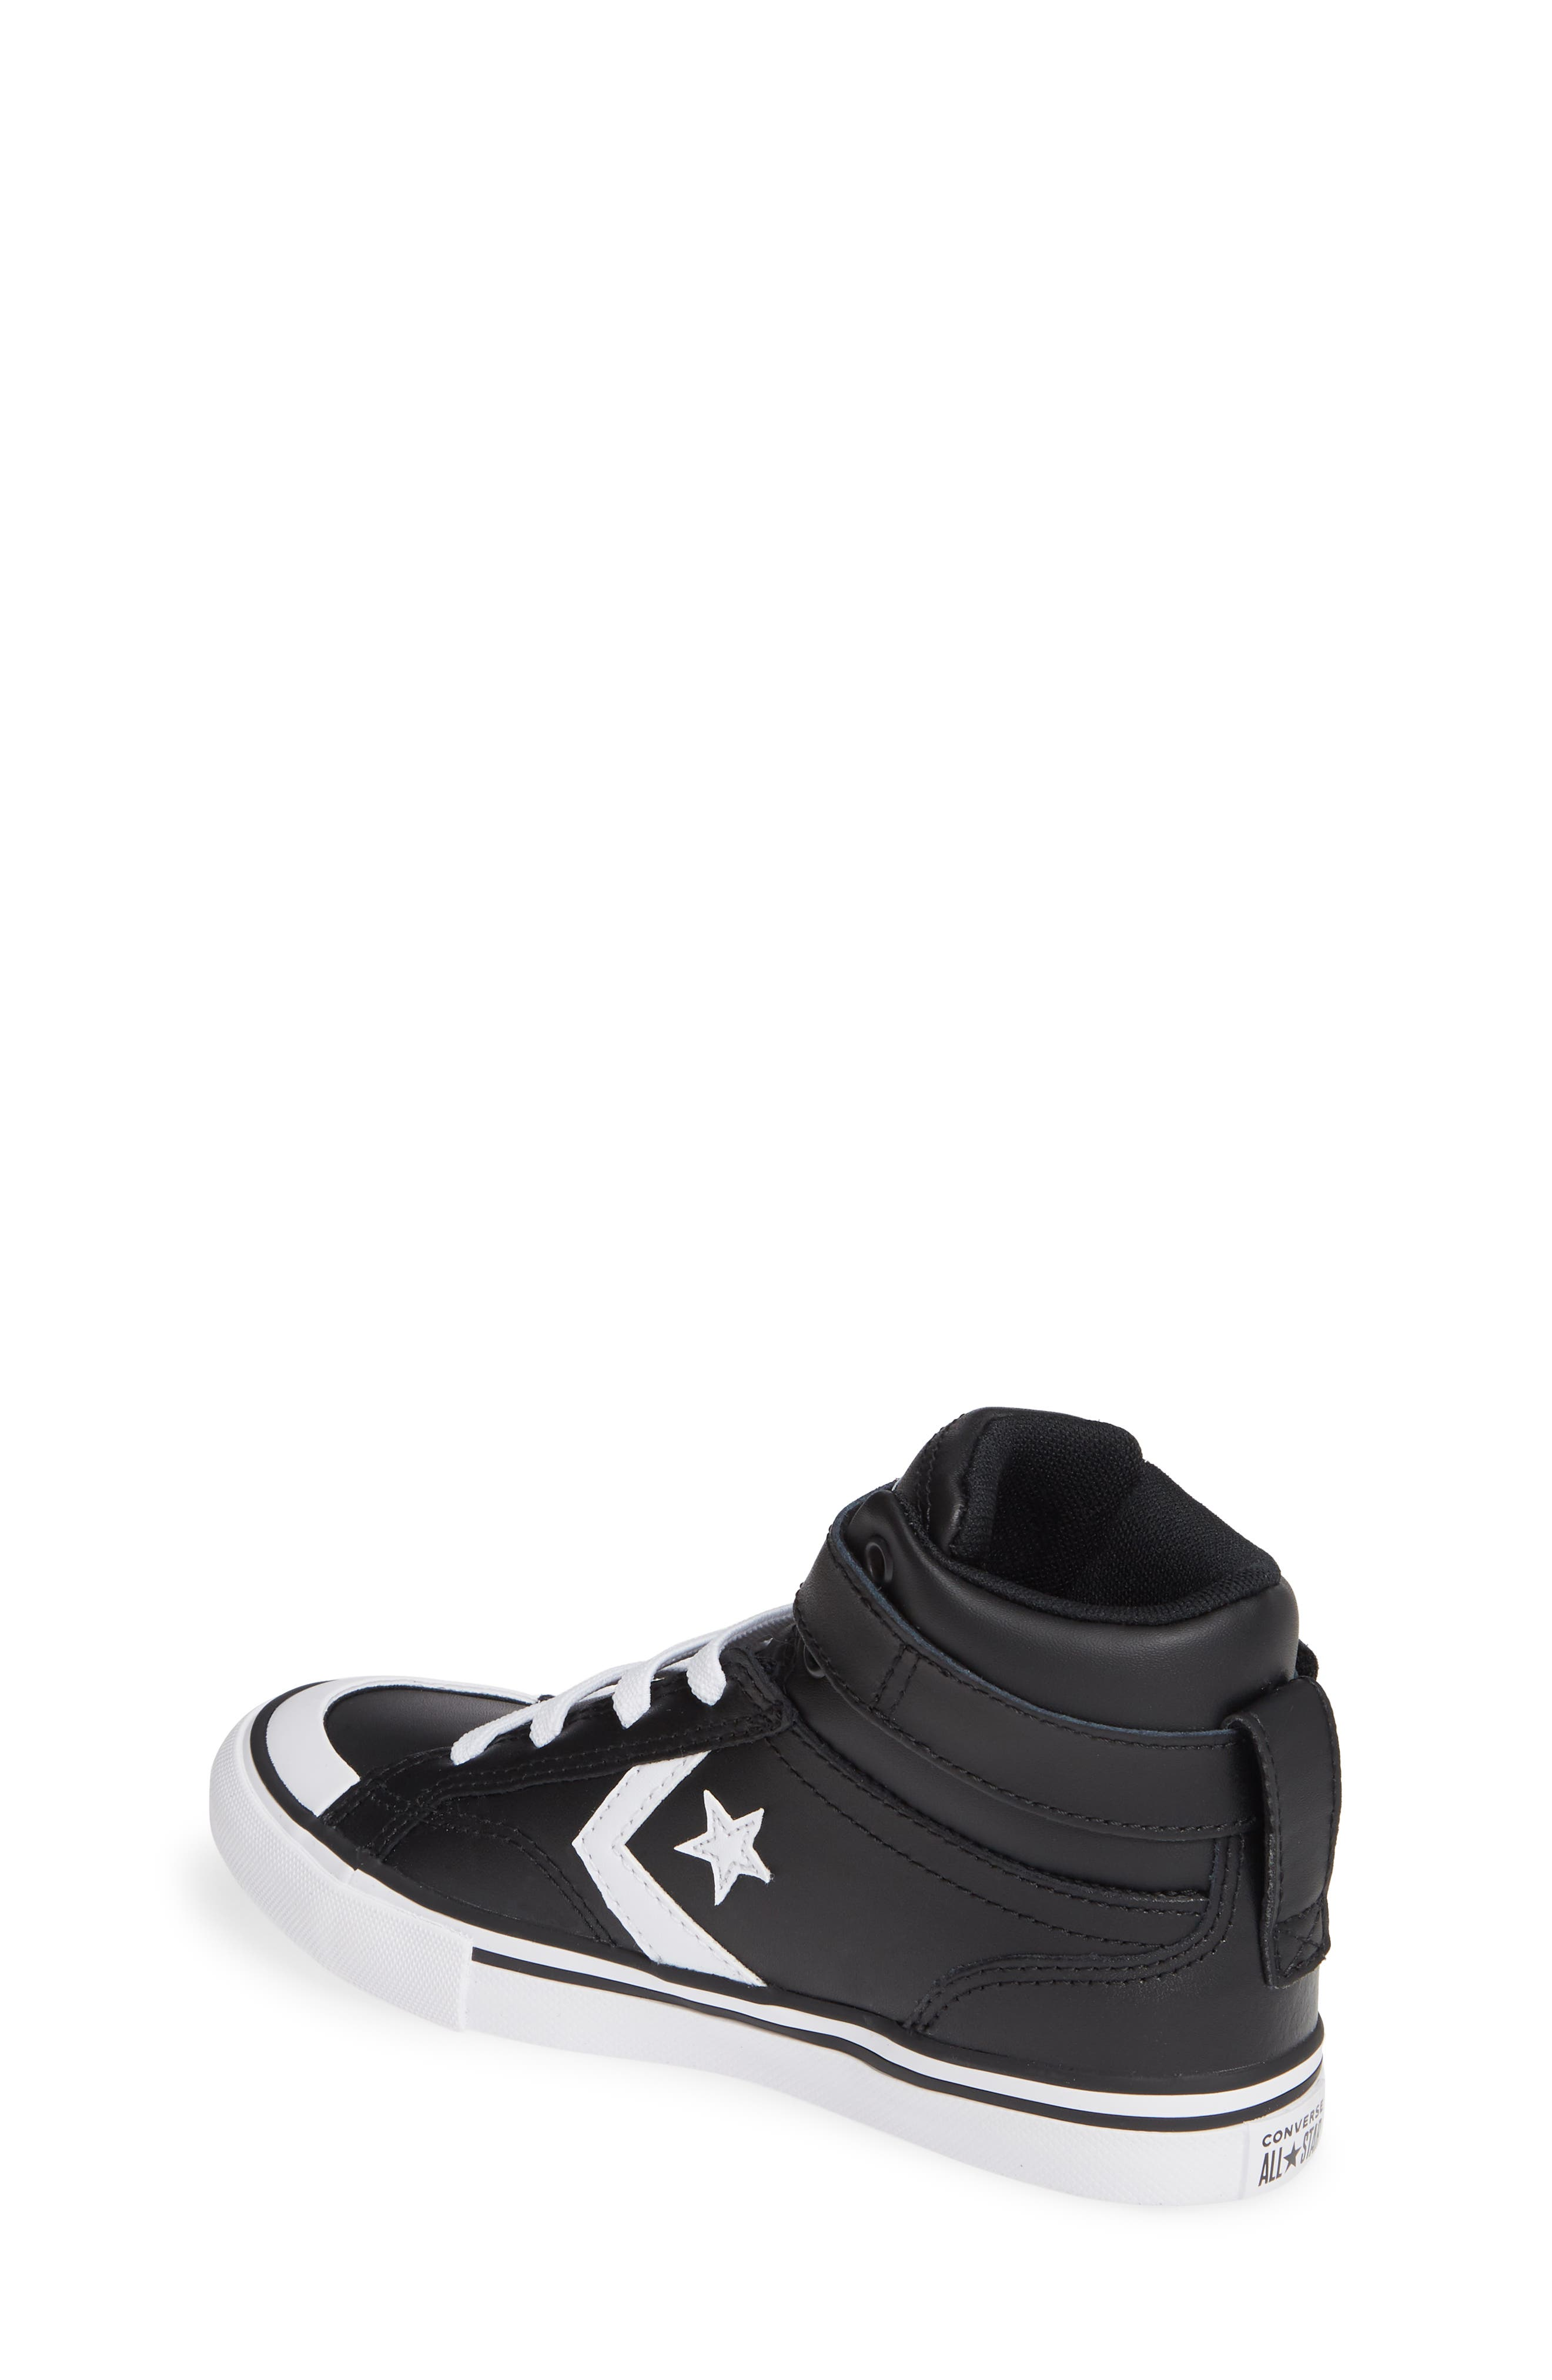 Big Boys  Converse Shoes (Sizes 3.5-7)  08c739f536a0a